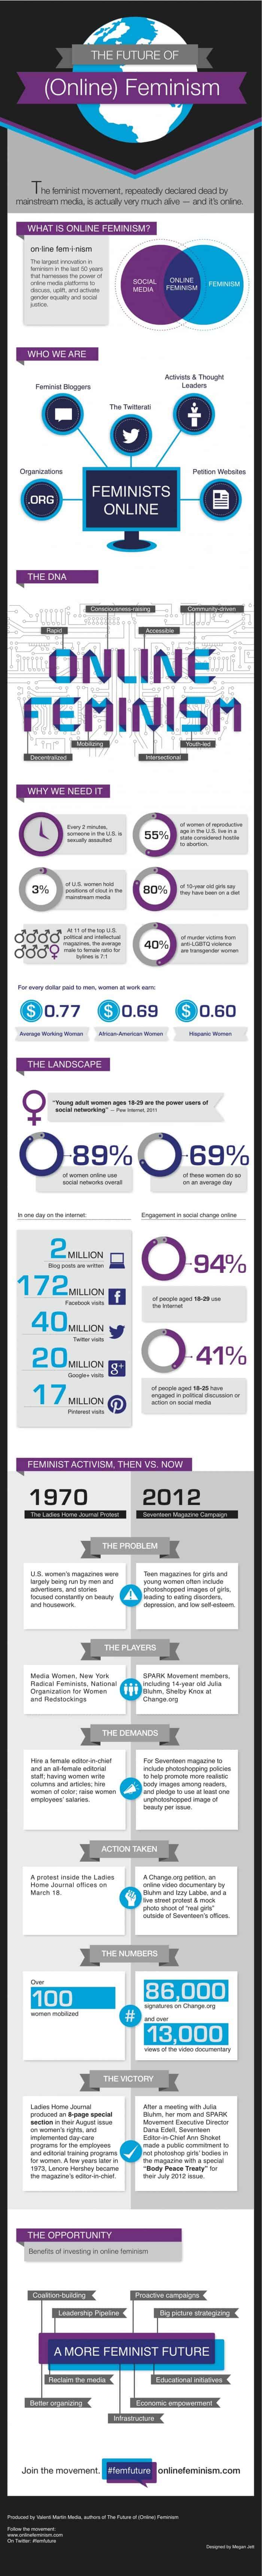 Future of Online Feminism Infographic